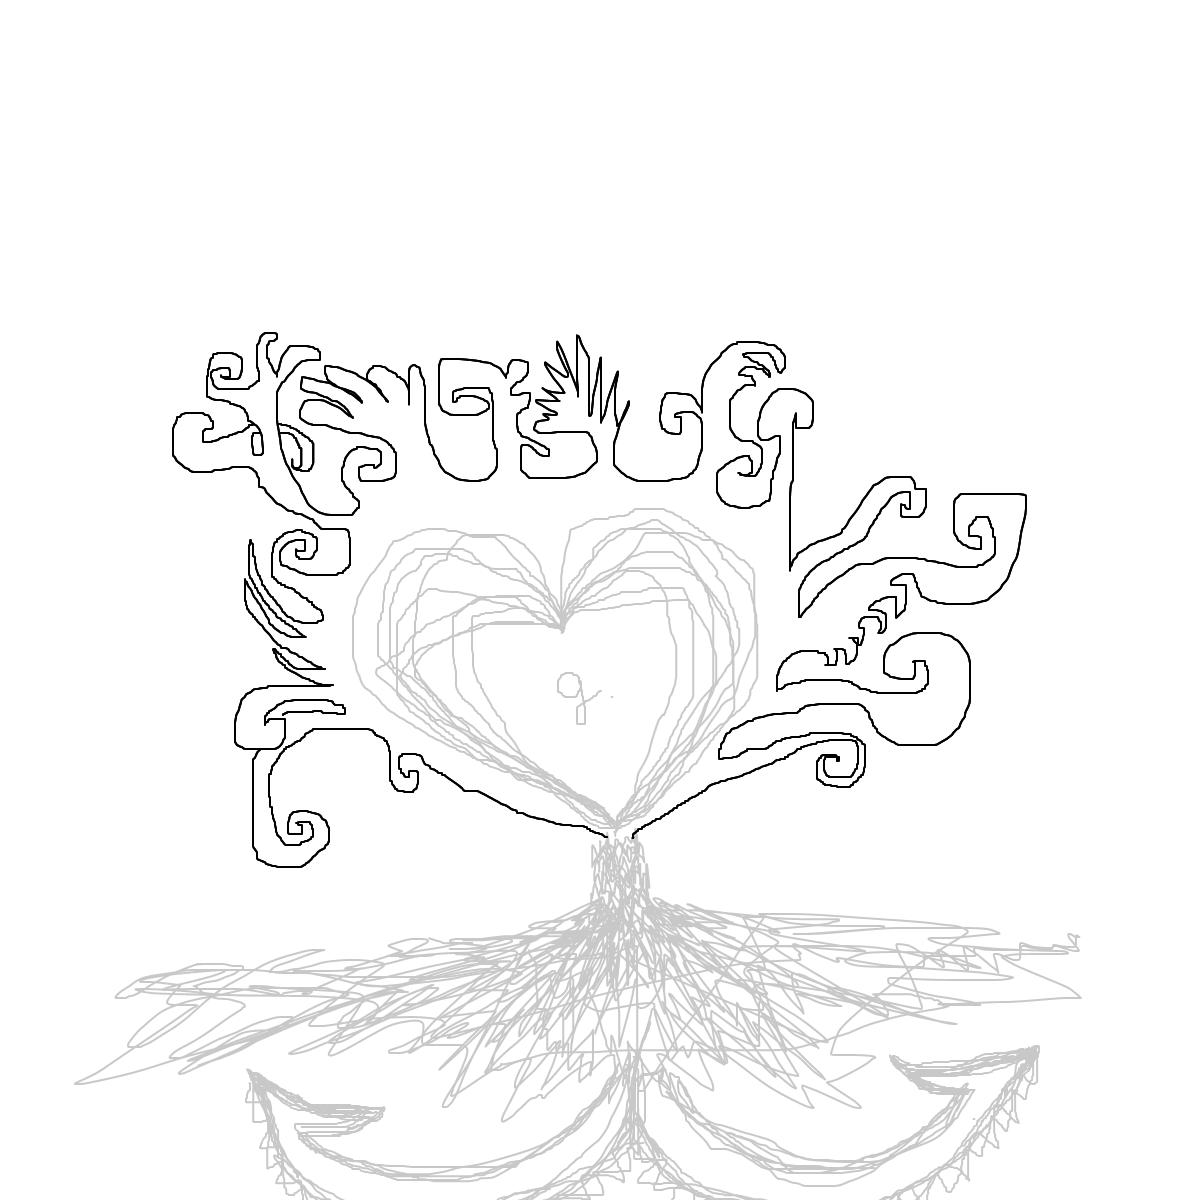 BAAAM drawing#8550 lat:46.0360069274902340lng: 18.6993618011474600